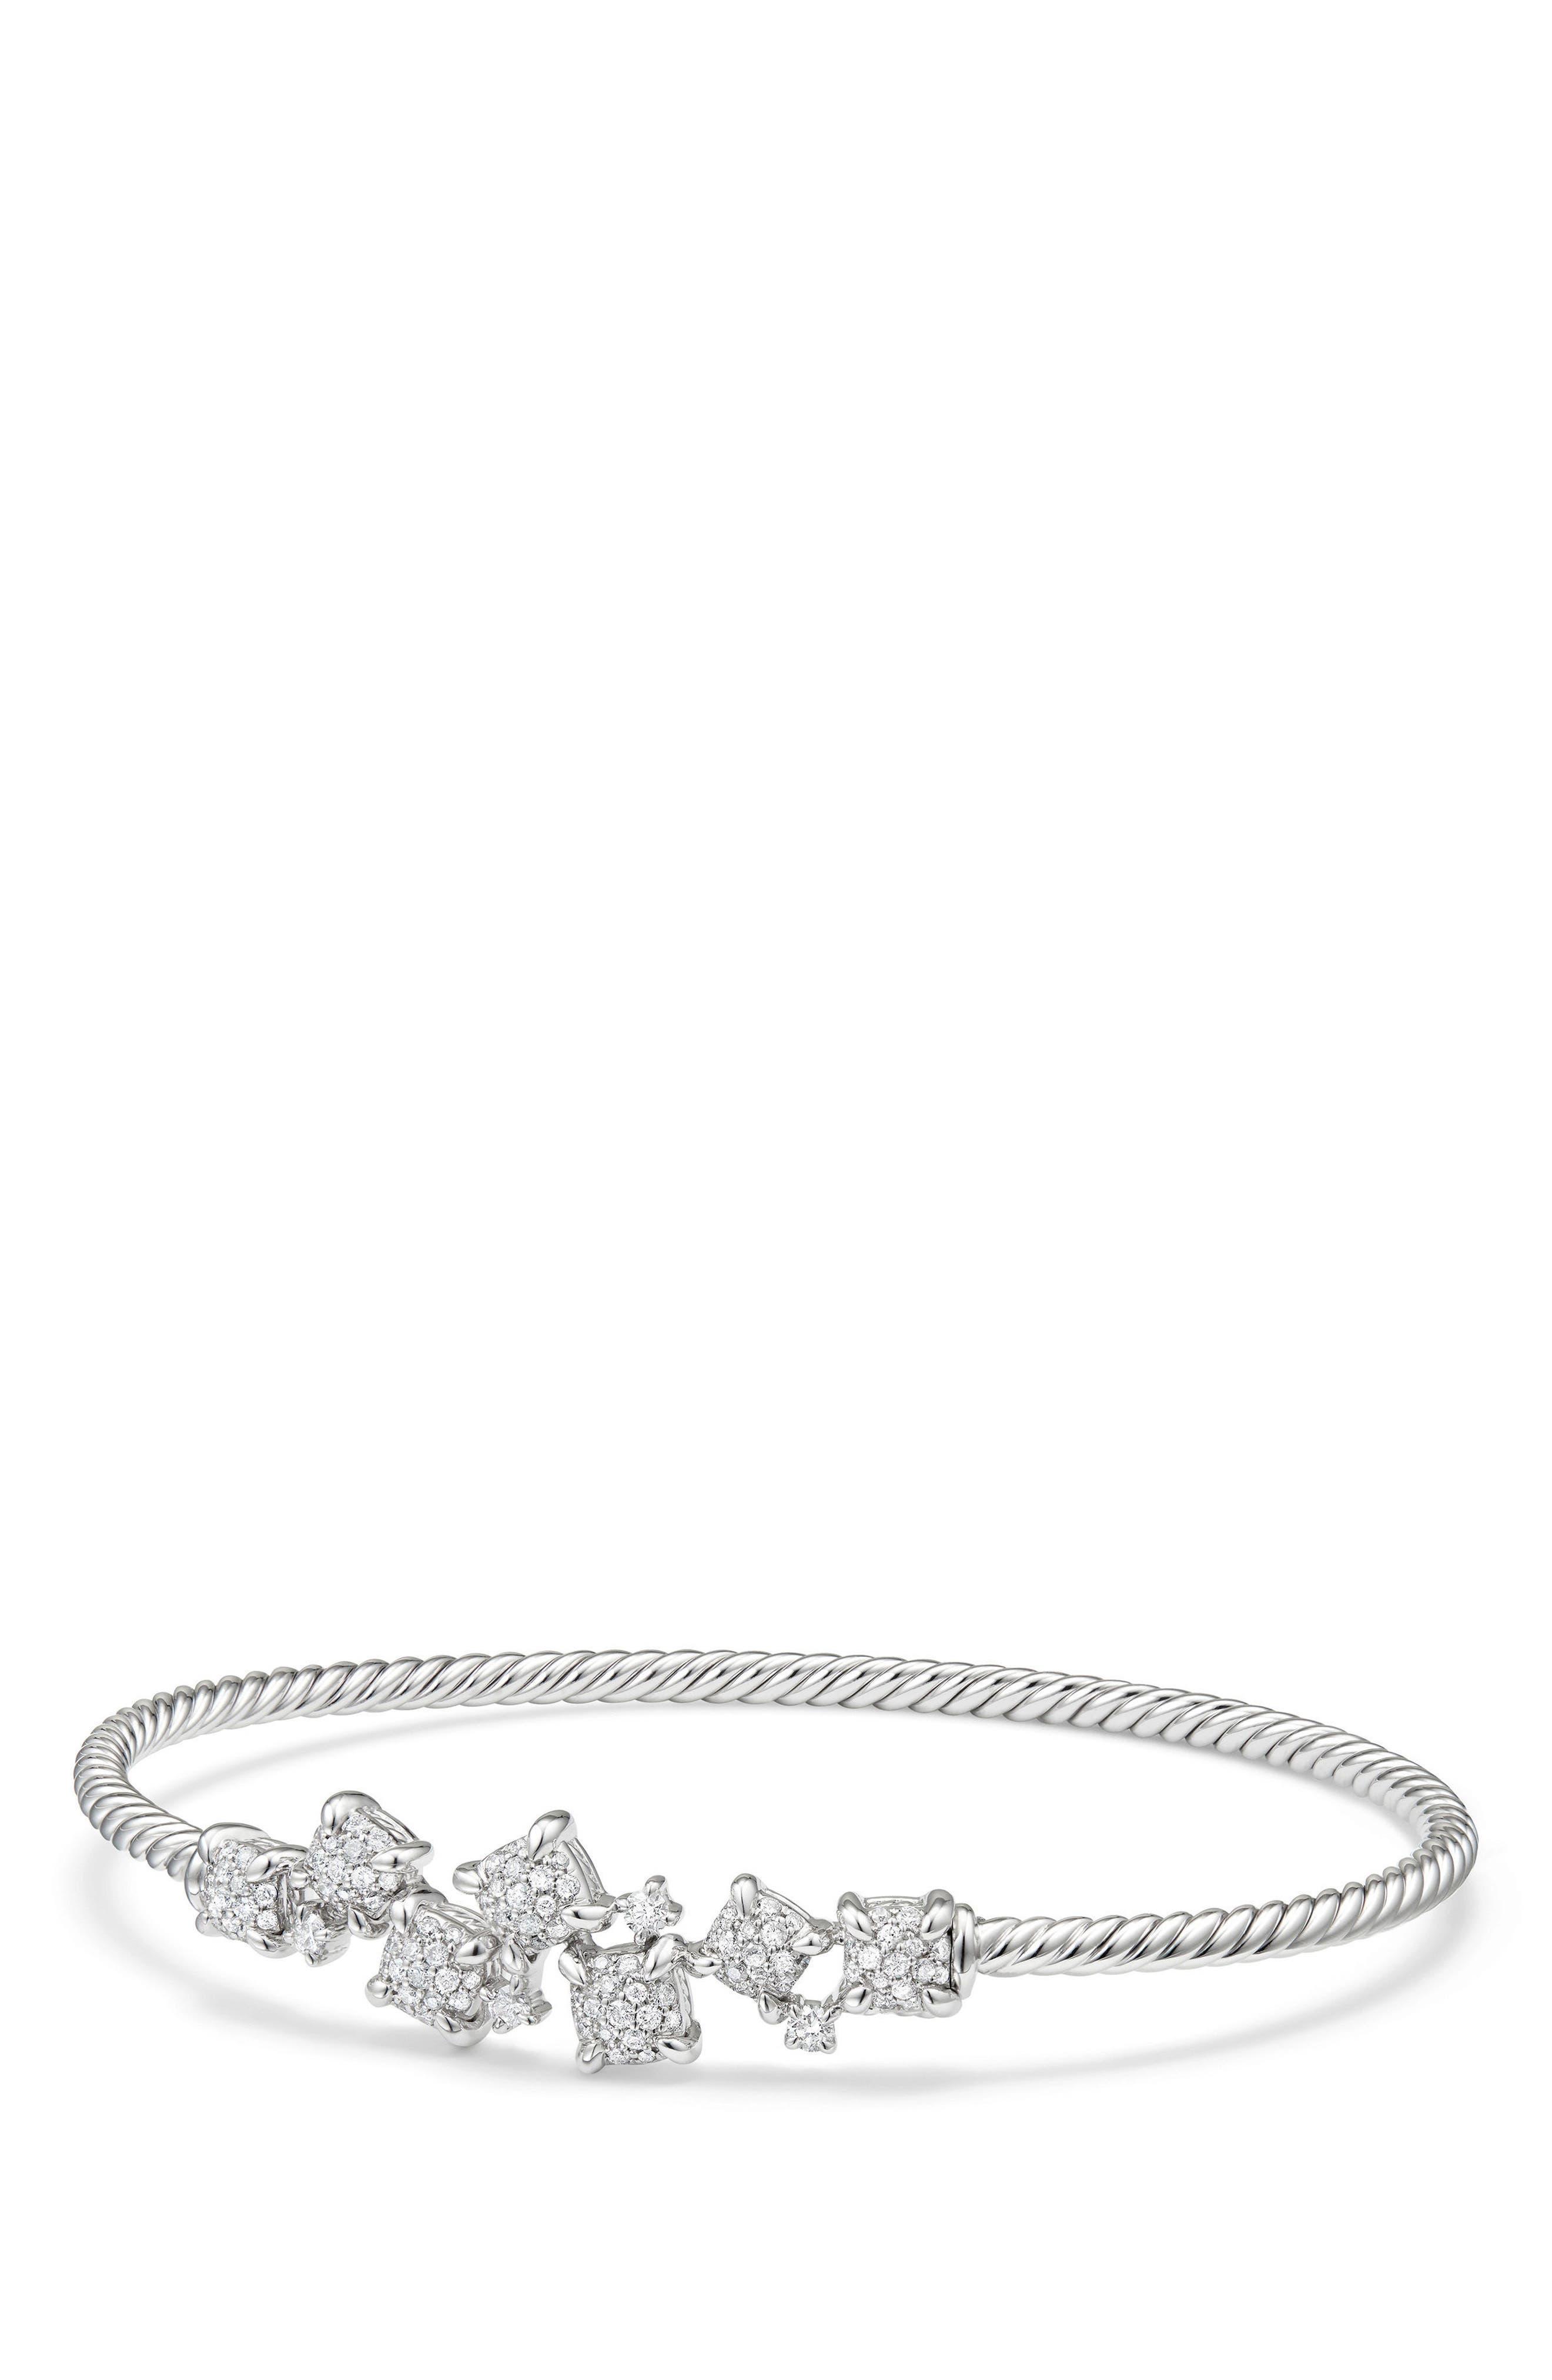 Precious Châtelaine Bracelet with Diamonds in 18K Gold,                         Main,                         color, WHITE GOLD/ DIAMOND